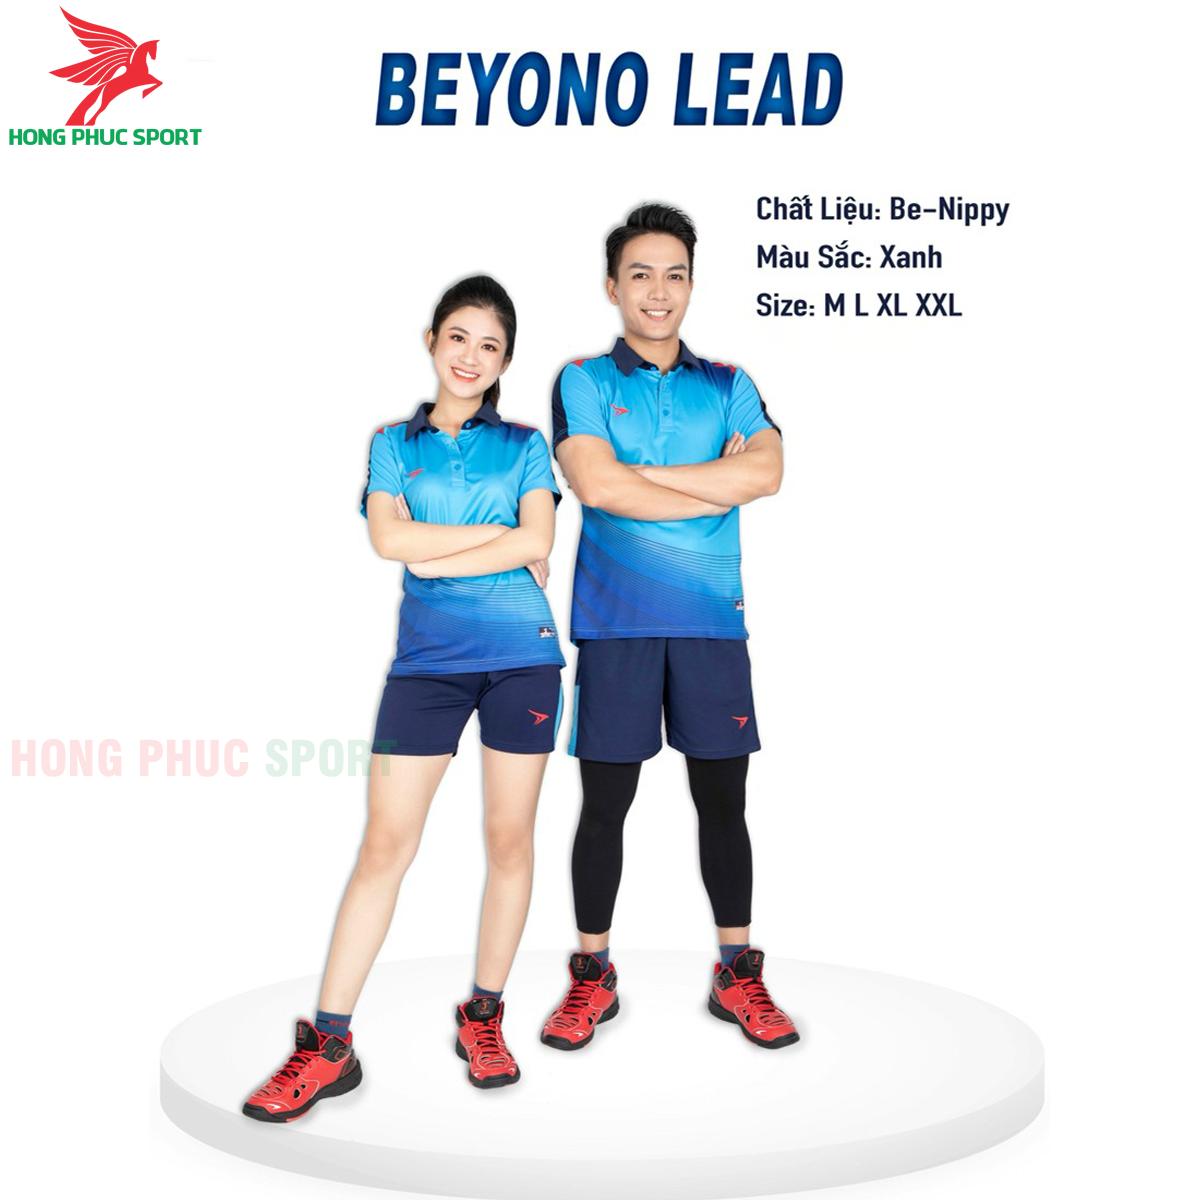 https://cdn.hongphucsport.com/unsafe/s4.shopbay.vn/files/285/ao-bong-chuyen-beyono-lead-mau-xanh-6039ce6ef2d49.png